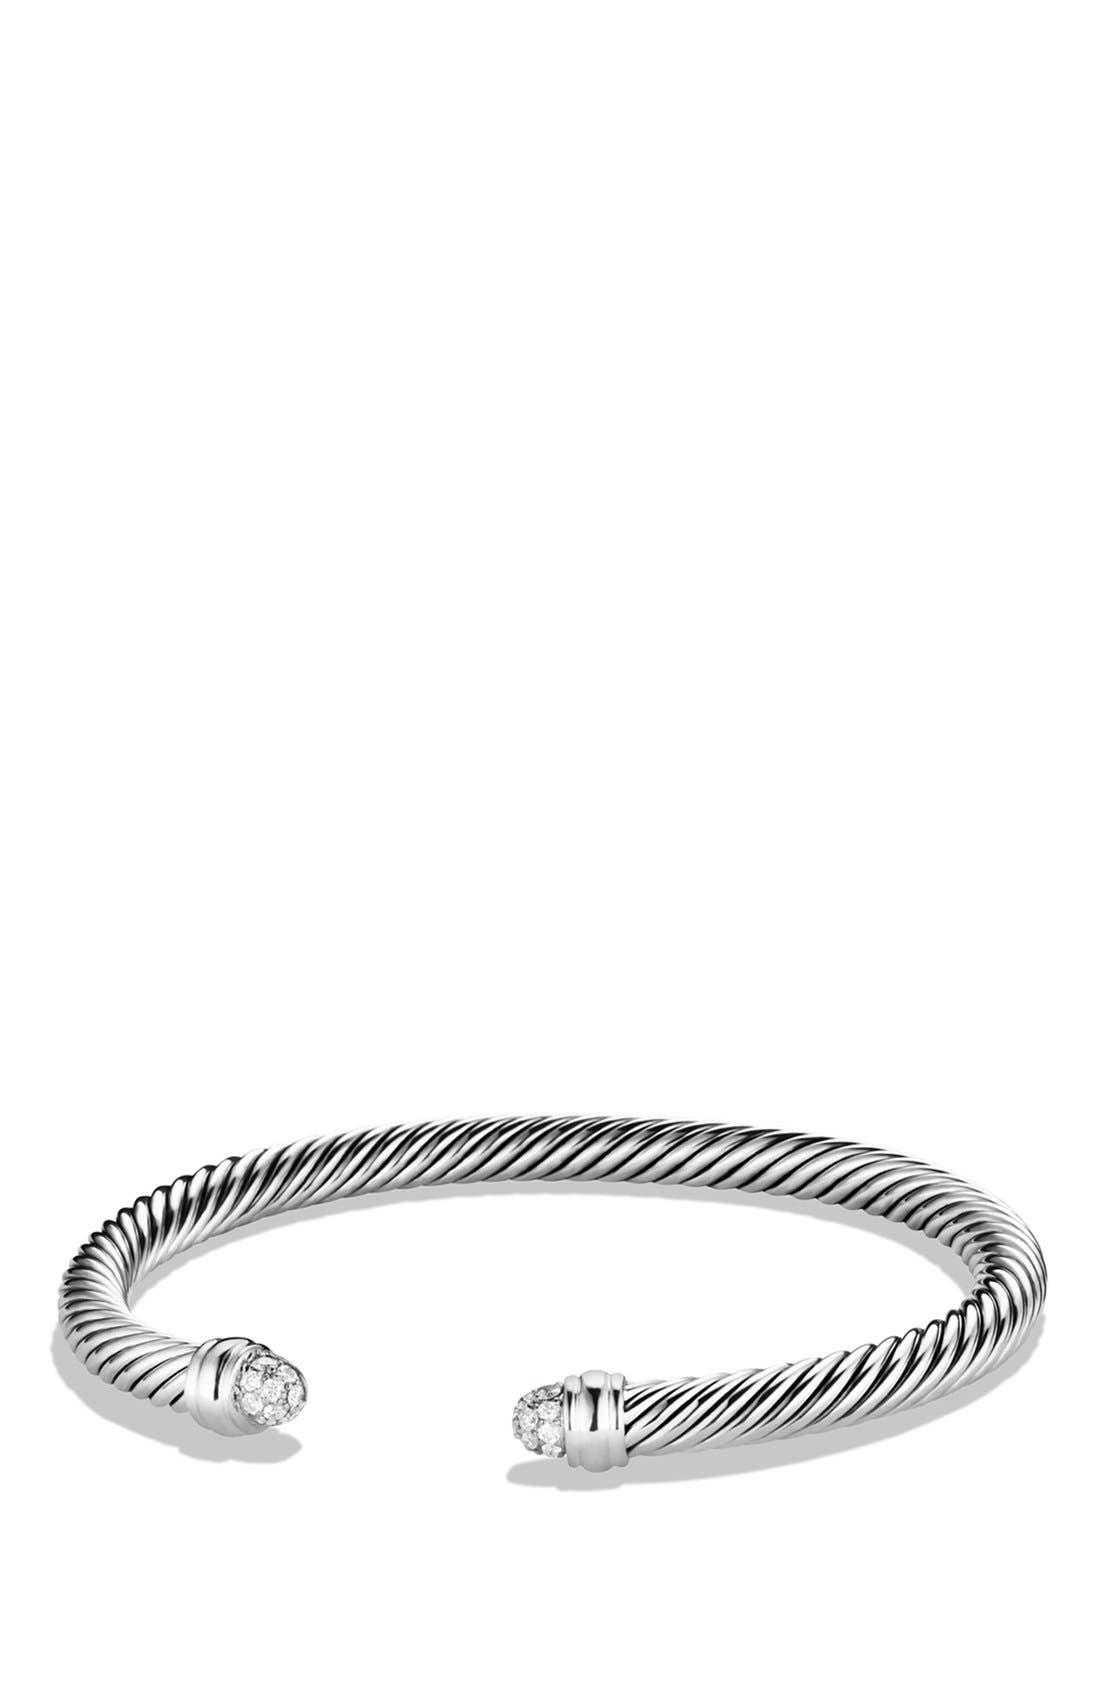 Cable Classics Bracelet with Diamonds, 5mm,                         Main,                         color, Diamond